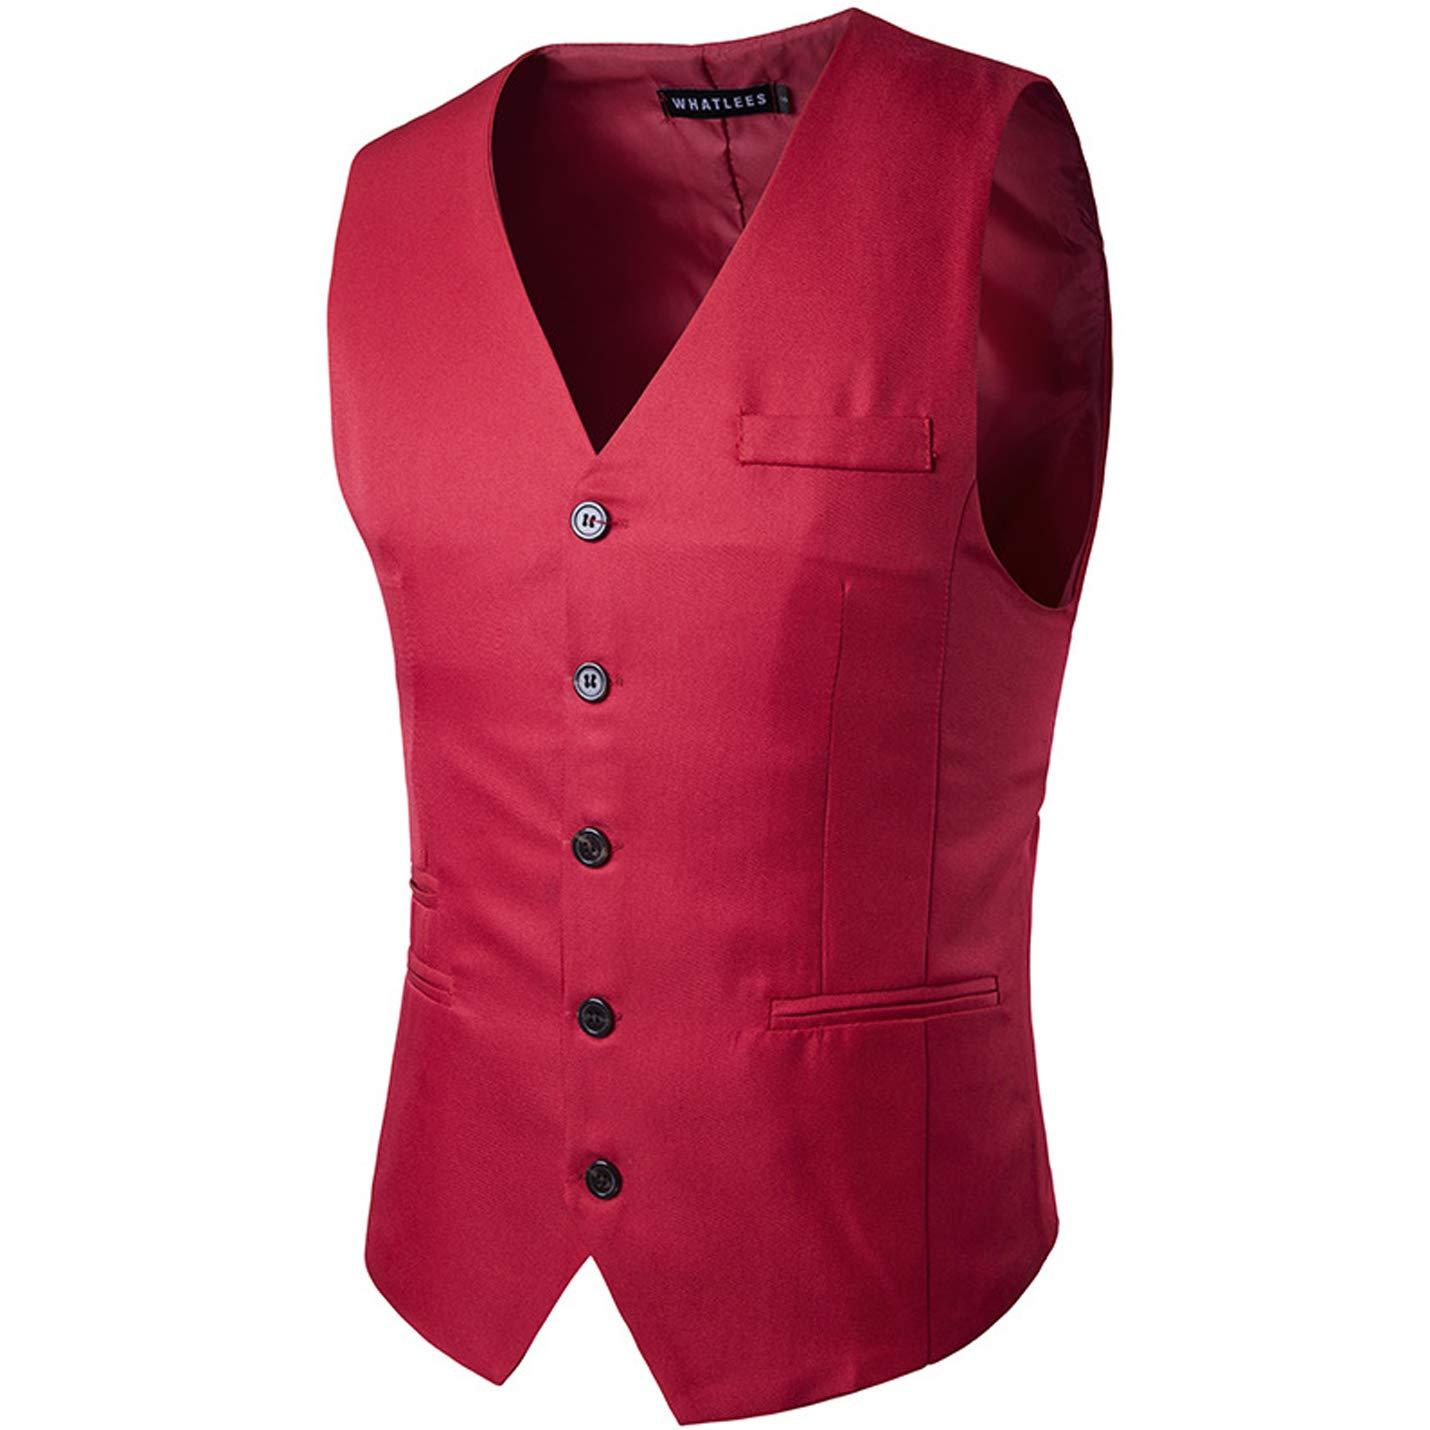 Flygo Women's V-Neck Sleeveless Slim Fit Skinny Vest Formal Business Suit Vest